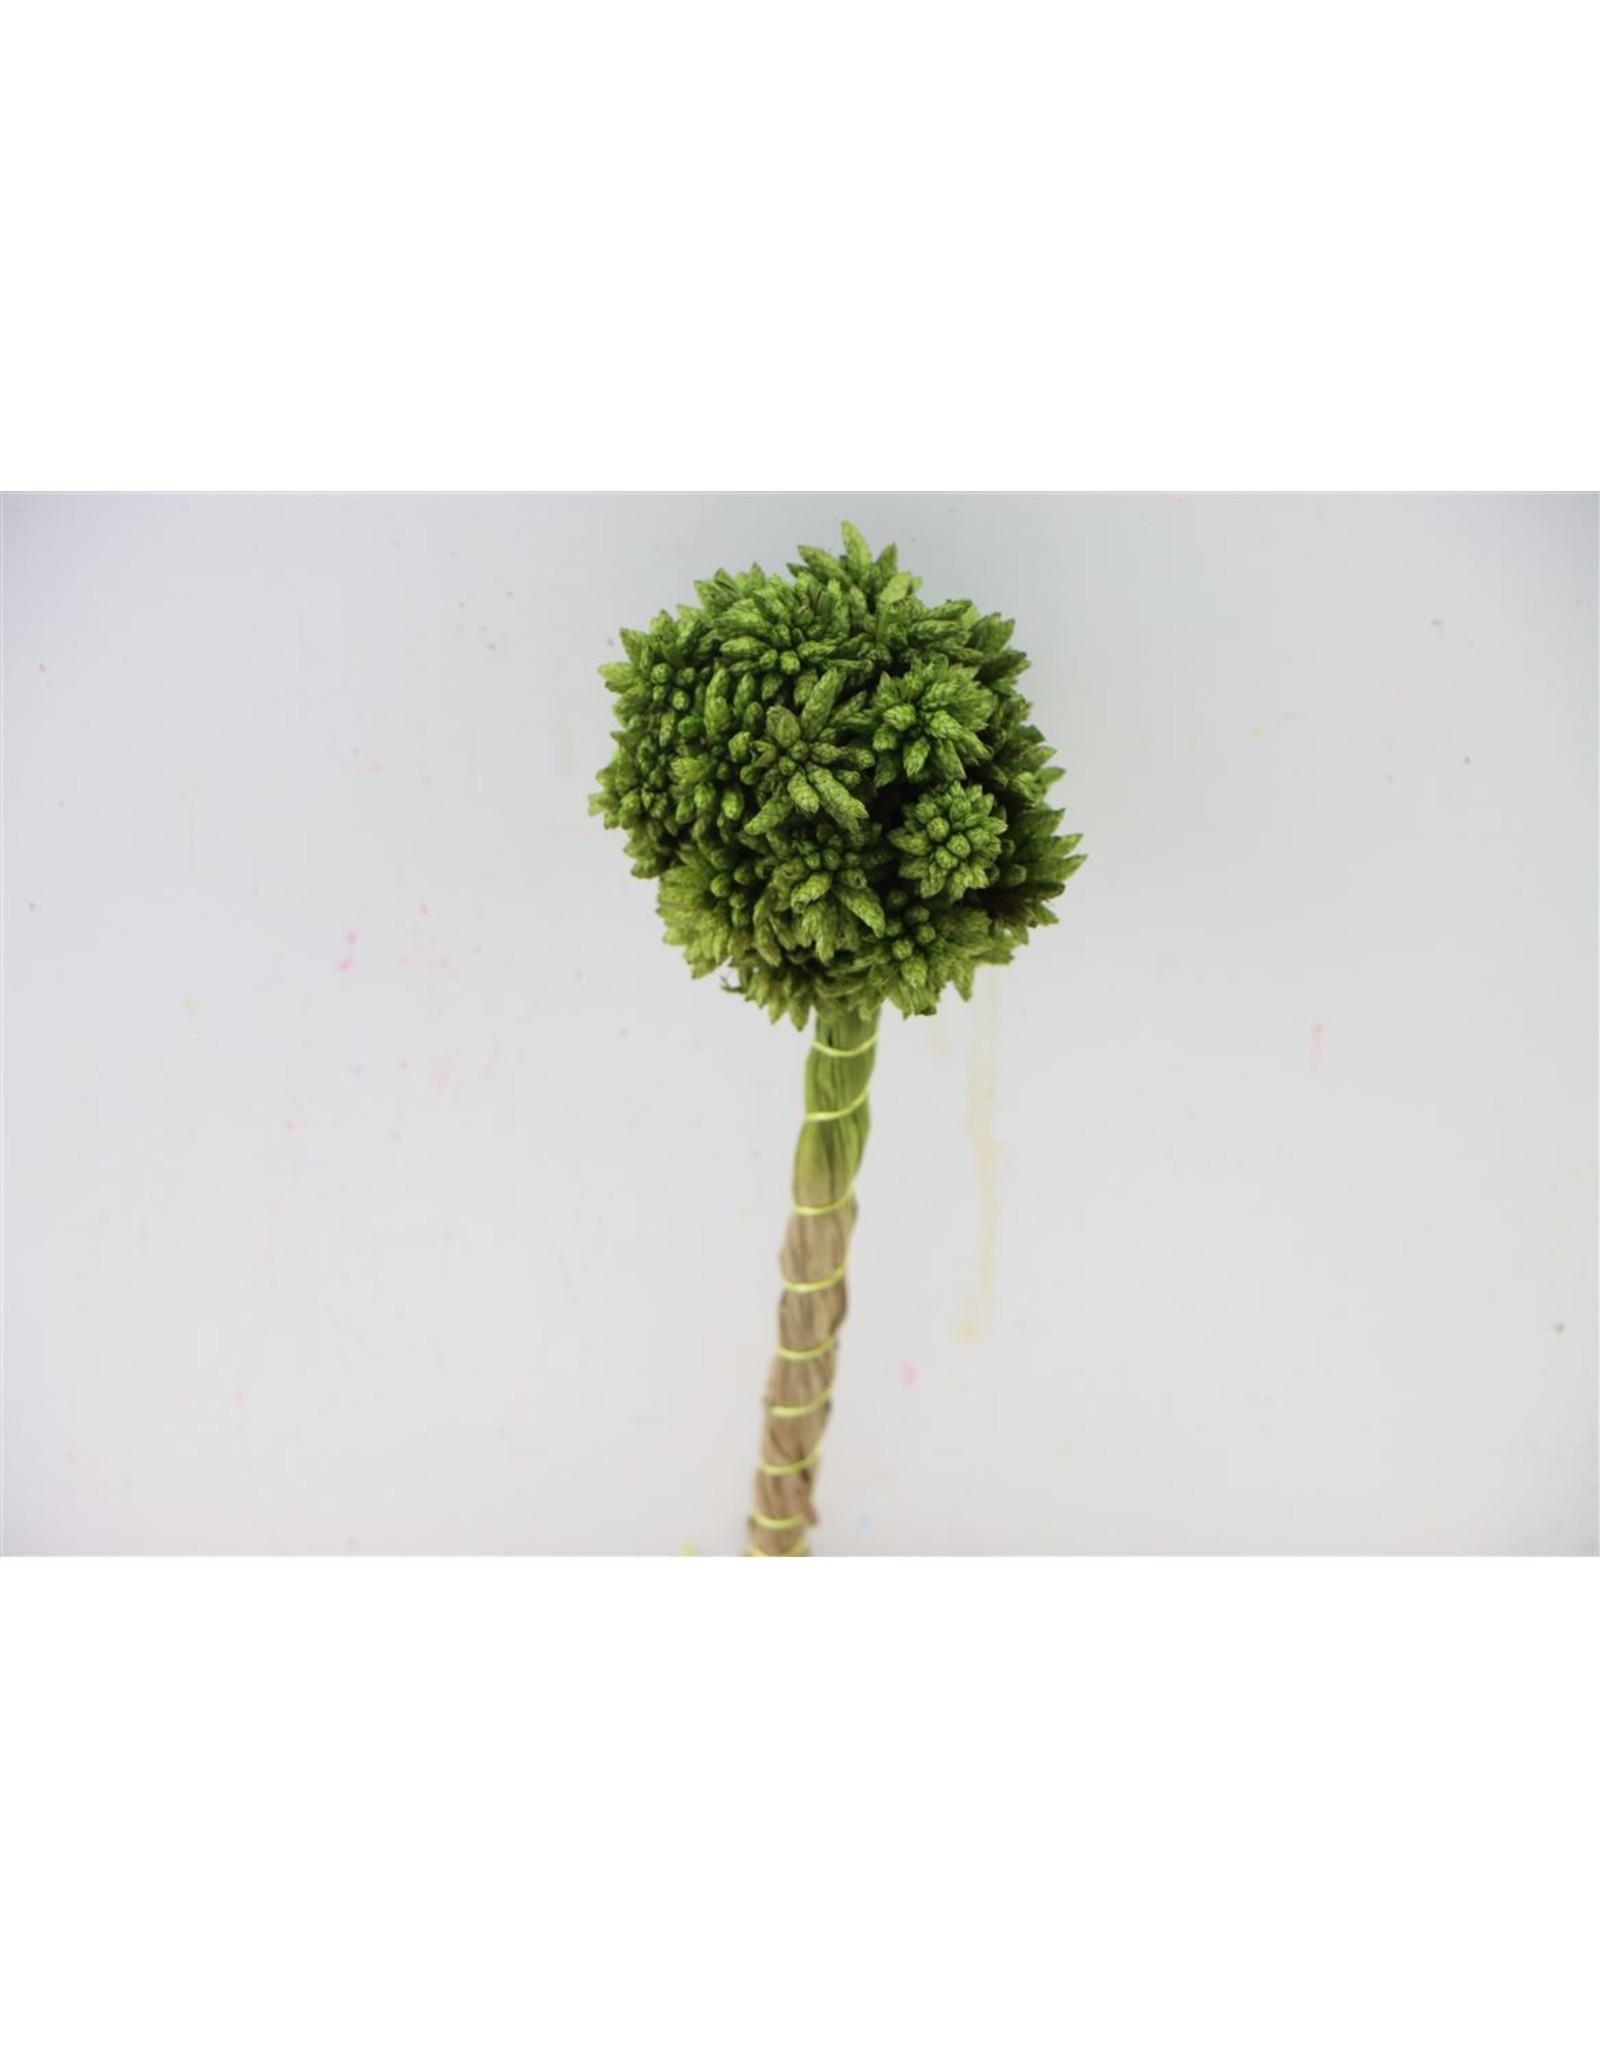 GF Dried Kai Mang Da Grass Green Bunch x 40